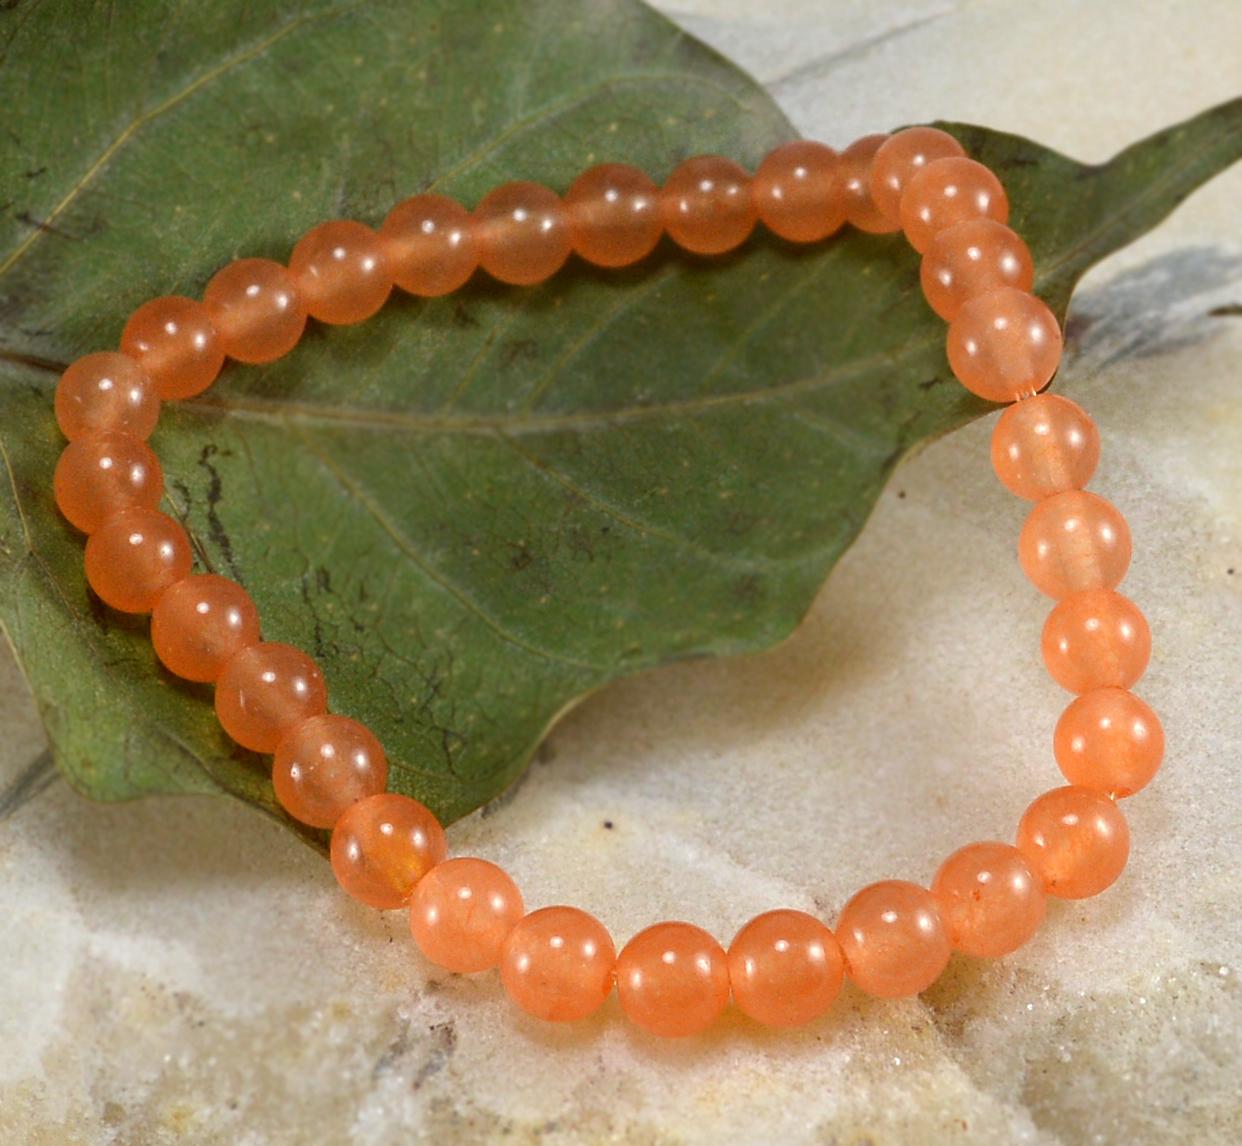 Handmade Jewelry Manufacturer men's Bracelet 6mm Light Orange Quartz, Energy, Yoga, Jaipur Rajasthan India Stretch Bracelet